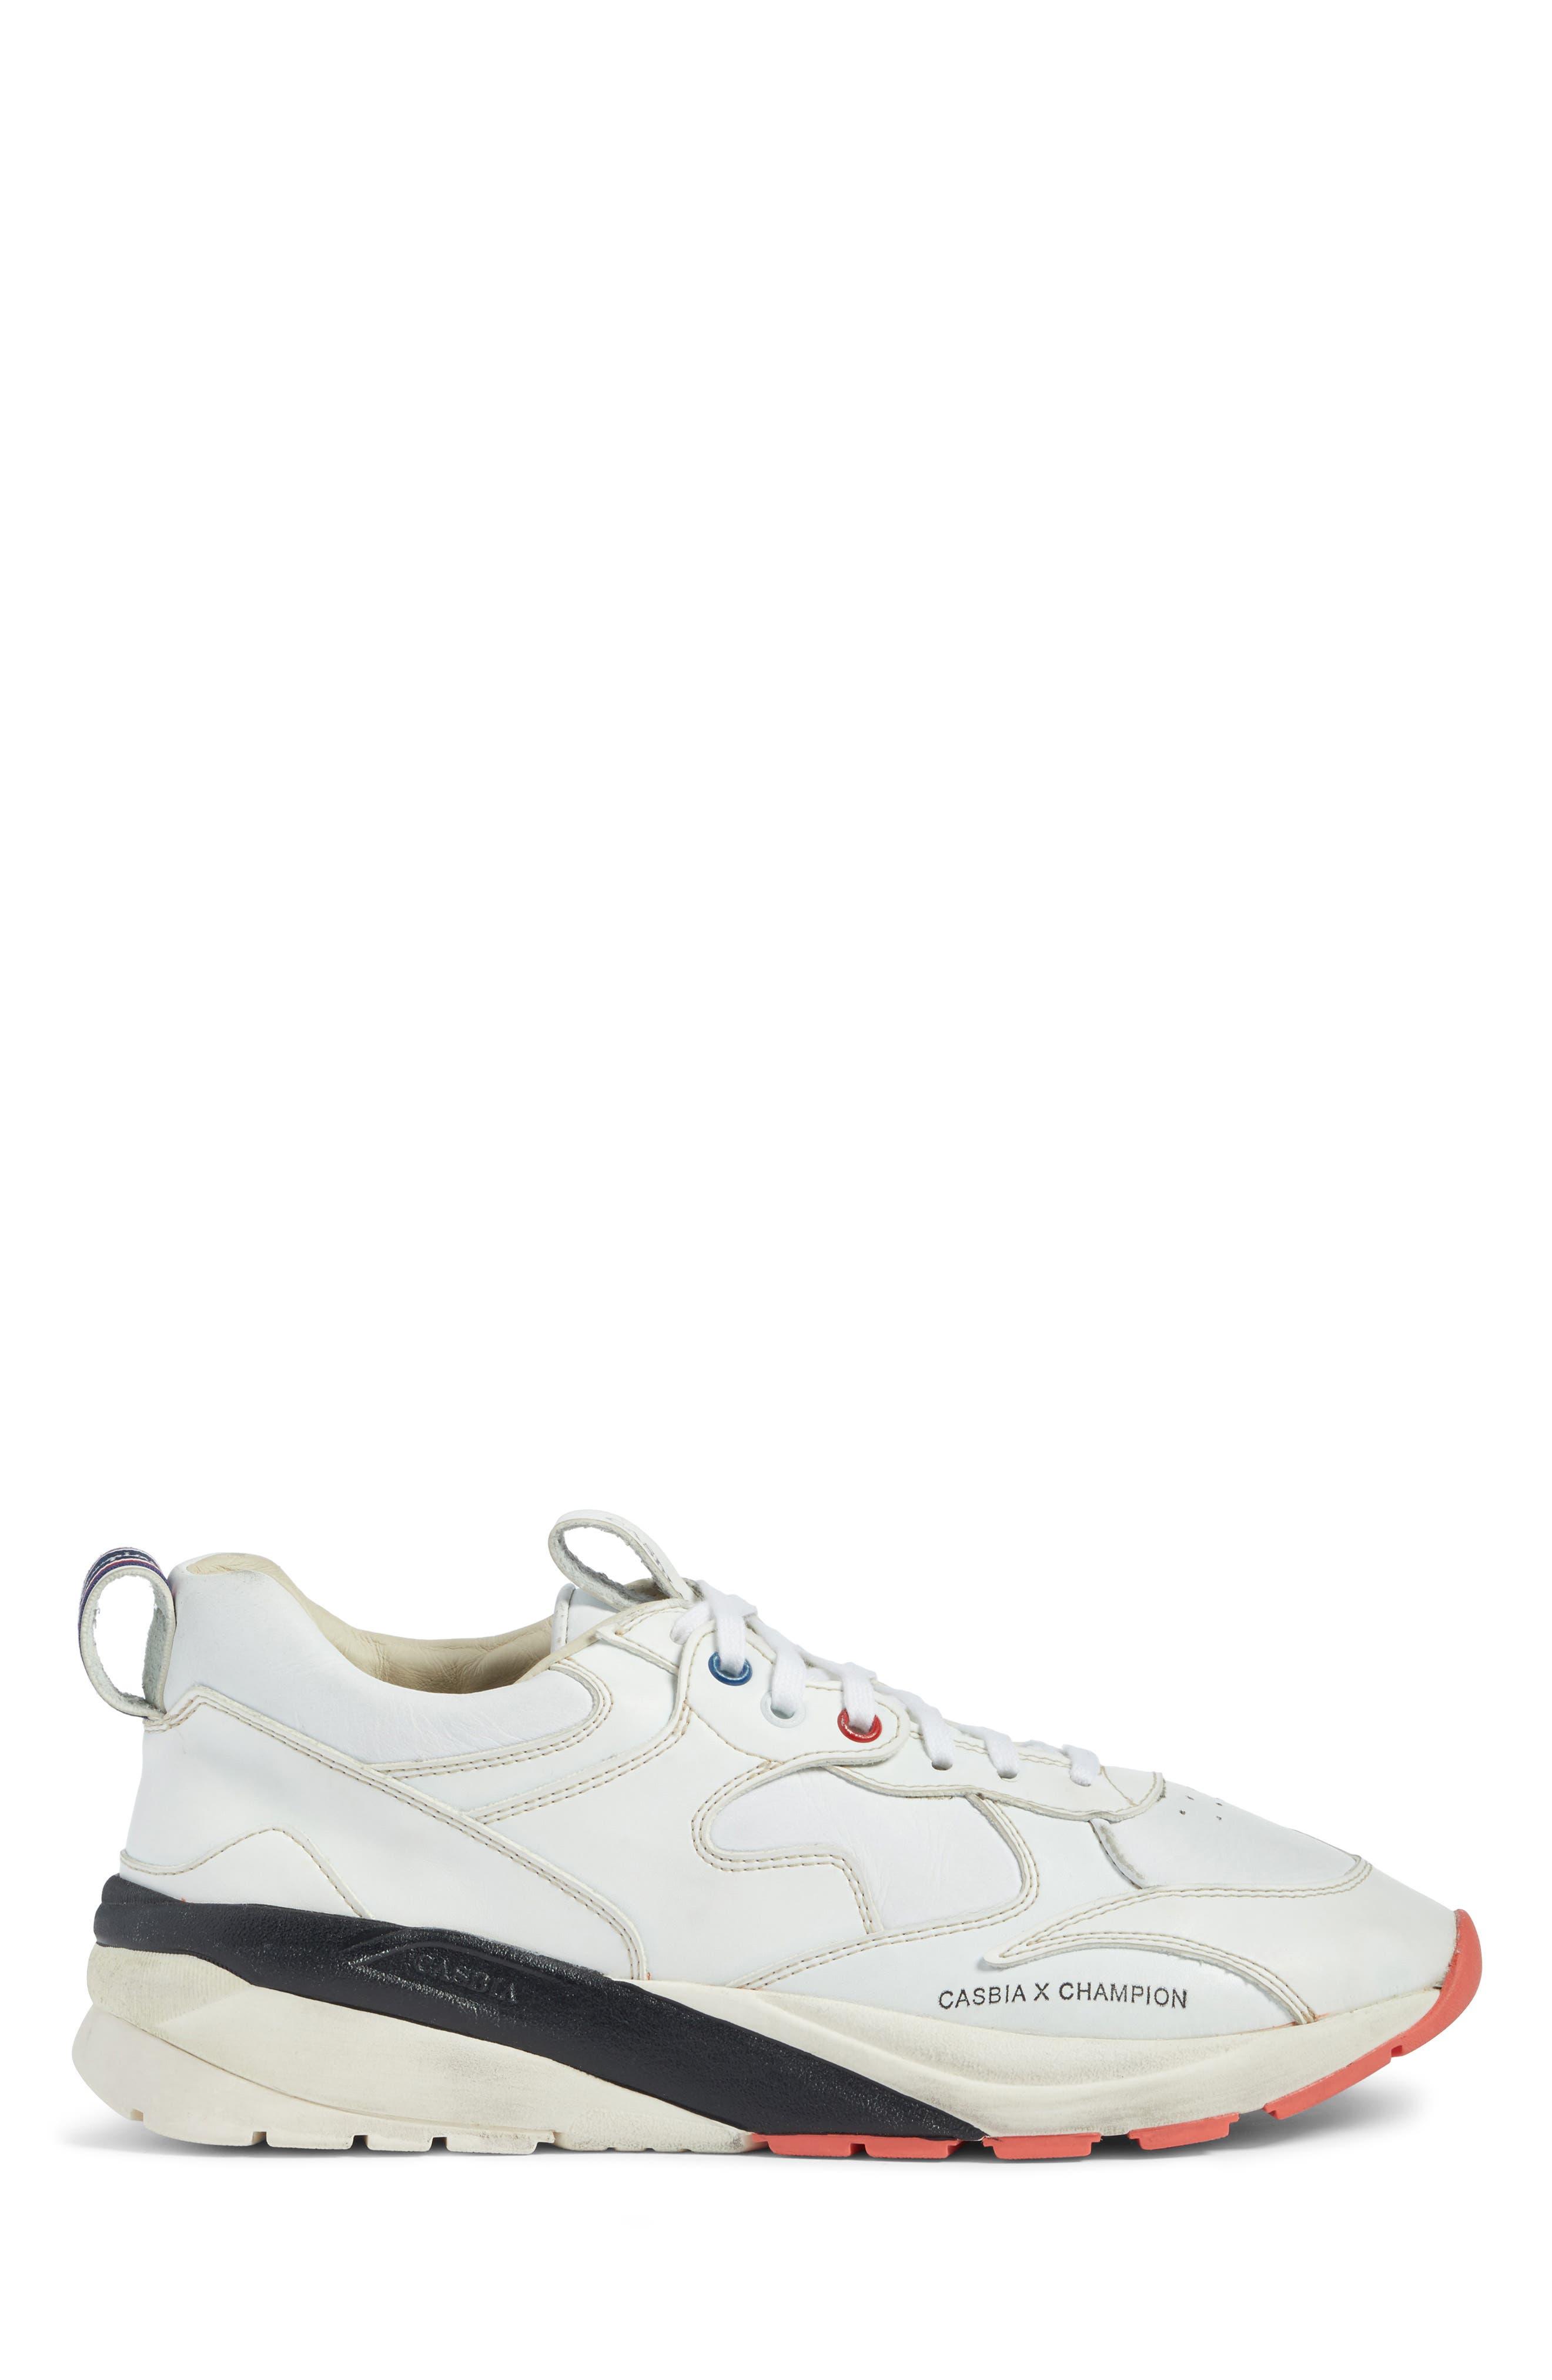 Champion Veloce ATL Sneaker,                             Alternate thumbnail 3, color,                             White Leather